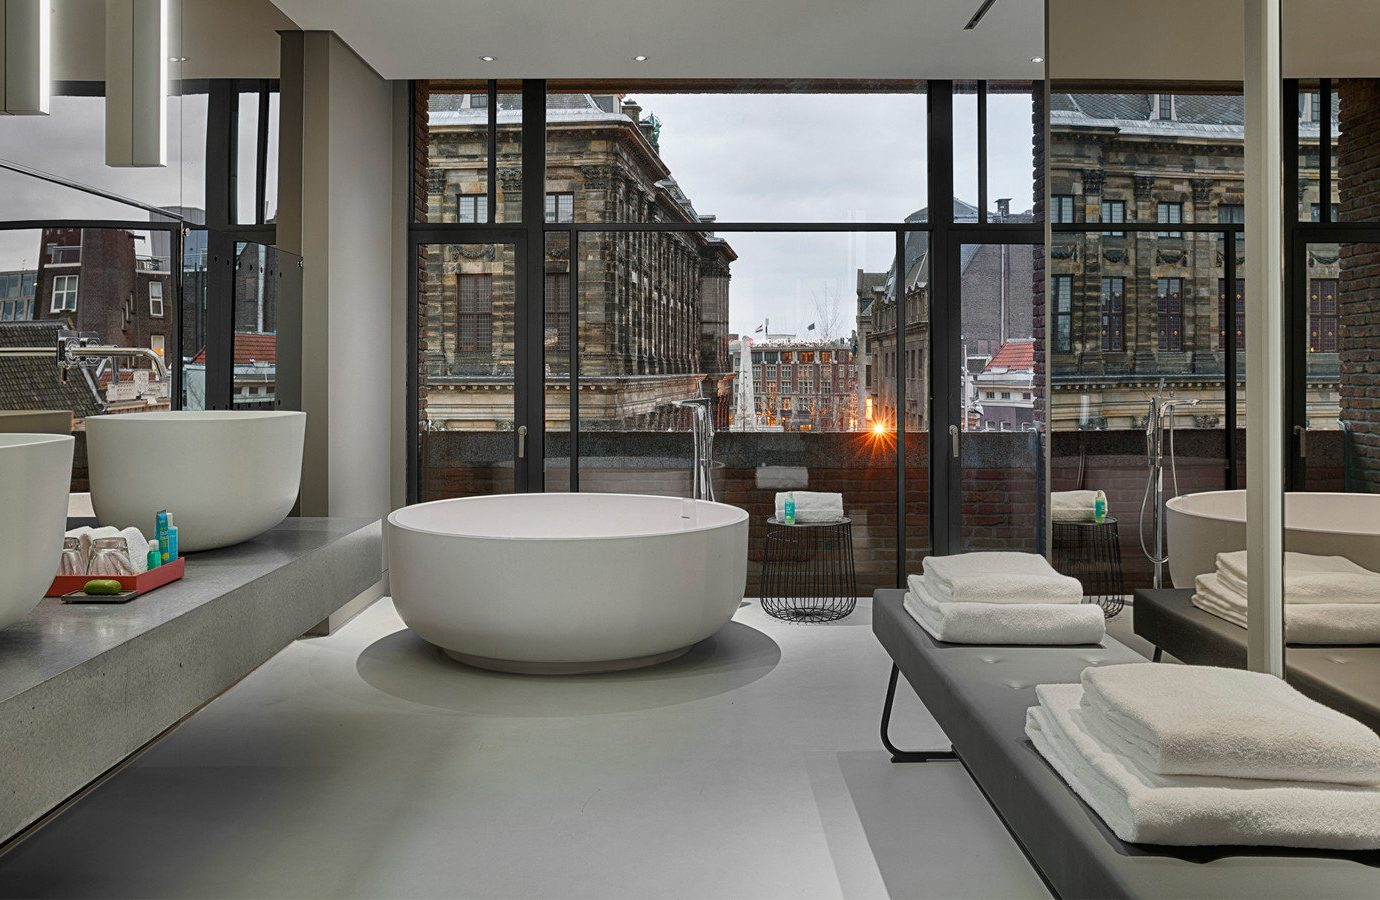 Amsterdam Hotels The Netherlands indoor window floor Architecture room interior design loft furniture Modern